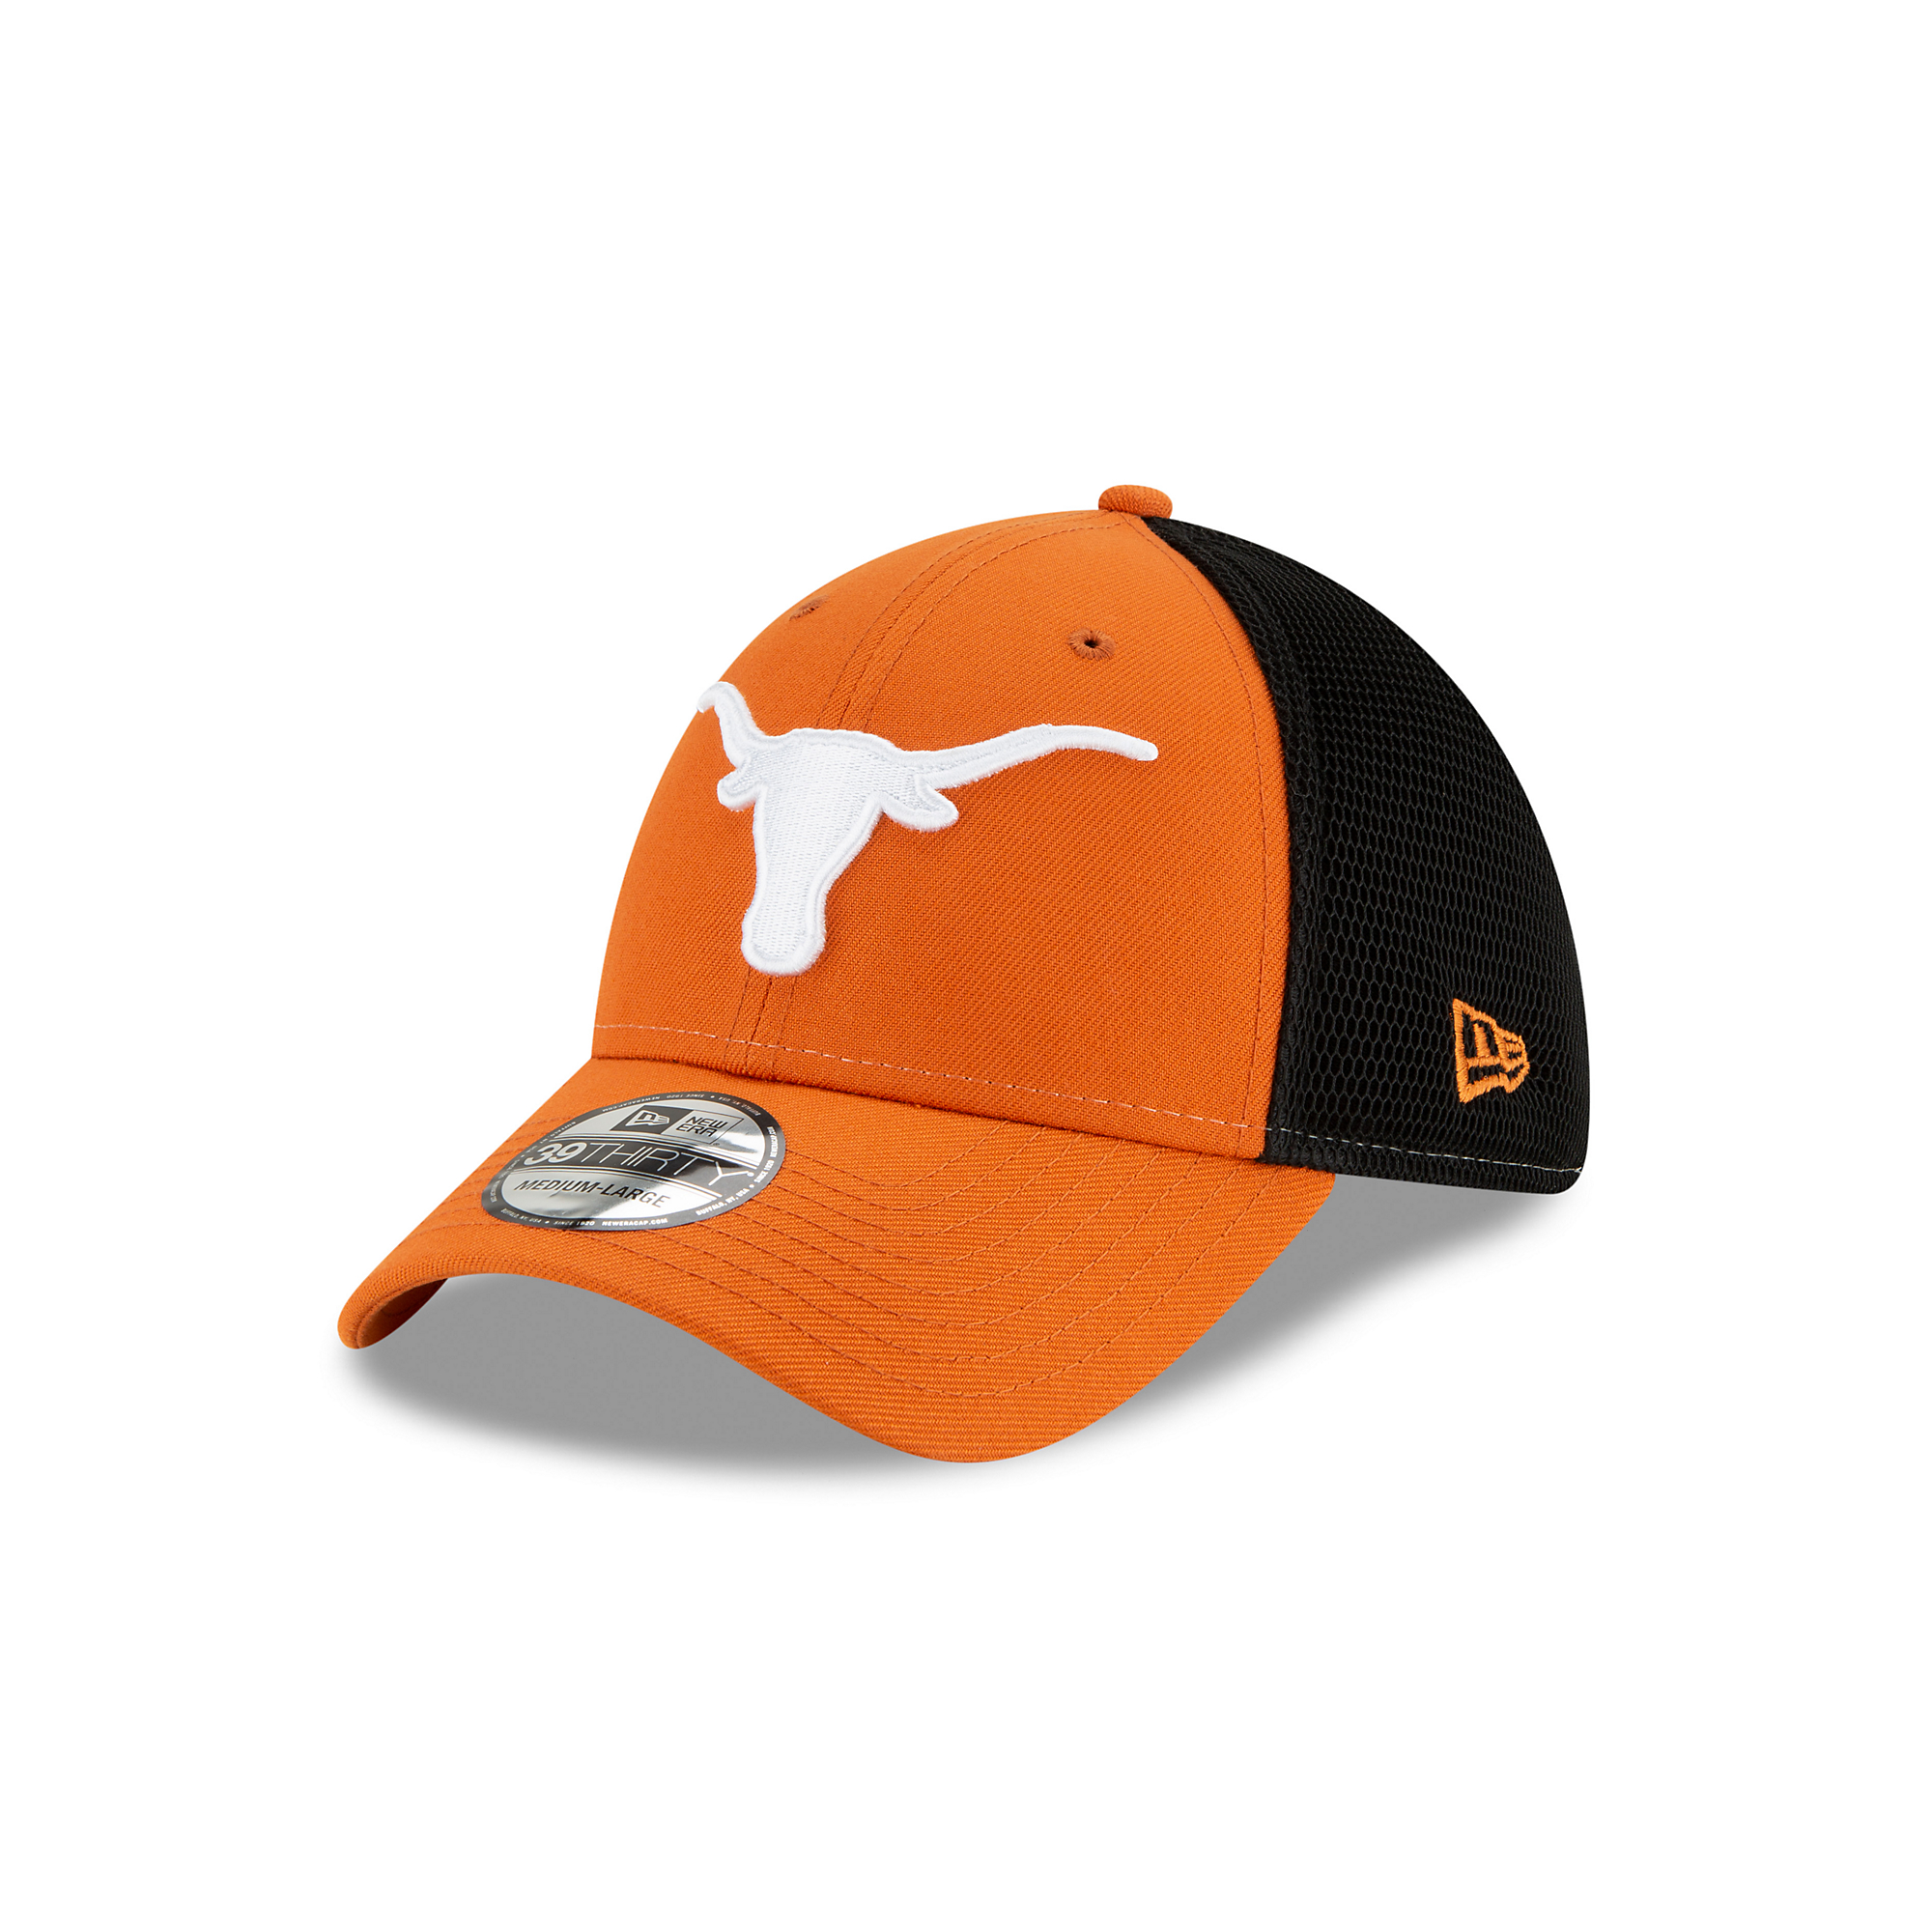 Texas Longhorns New Era Mens 2T Sided 39Thirty Cap